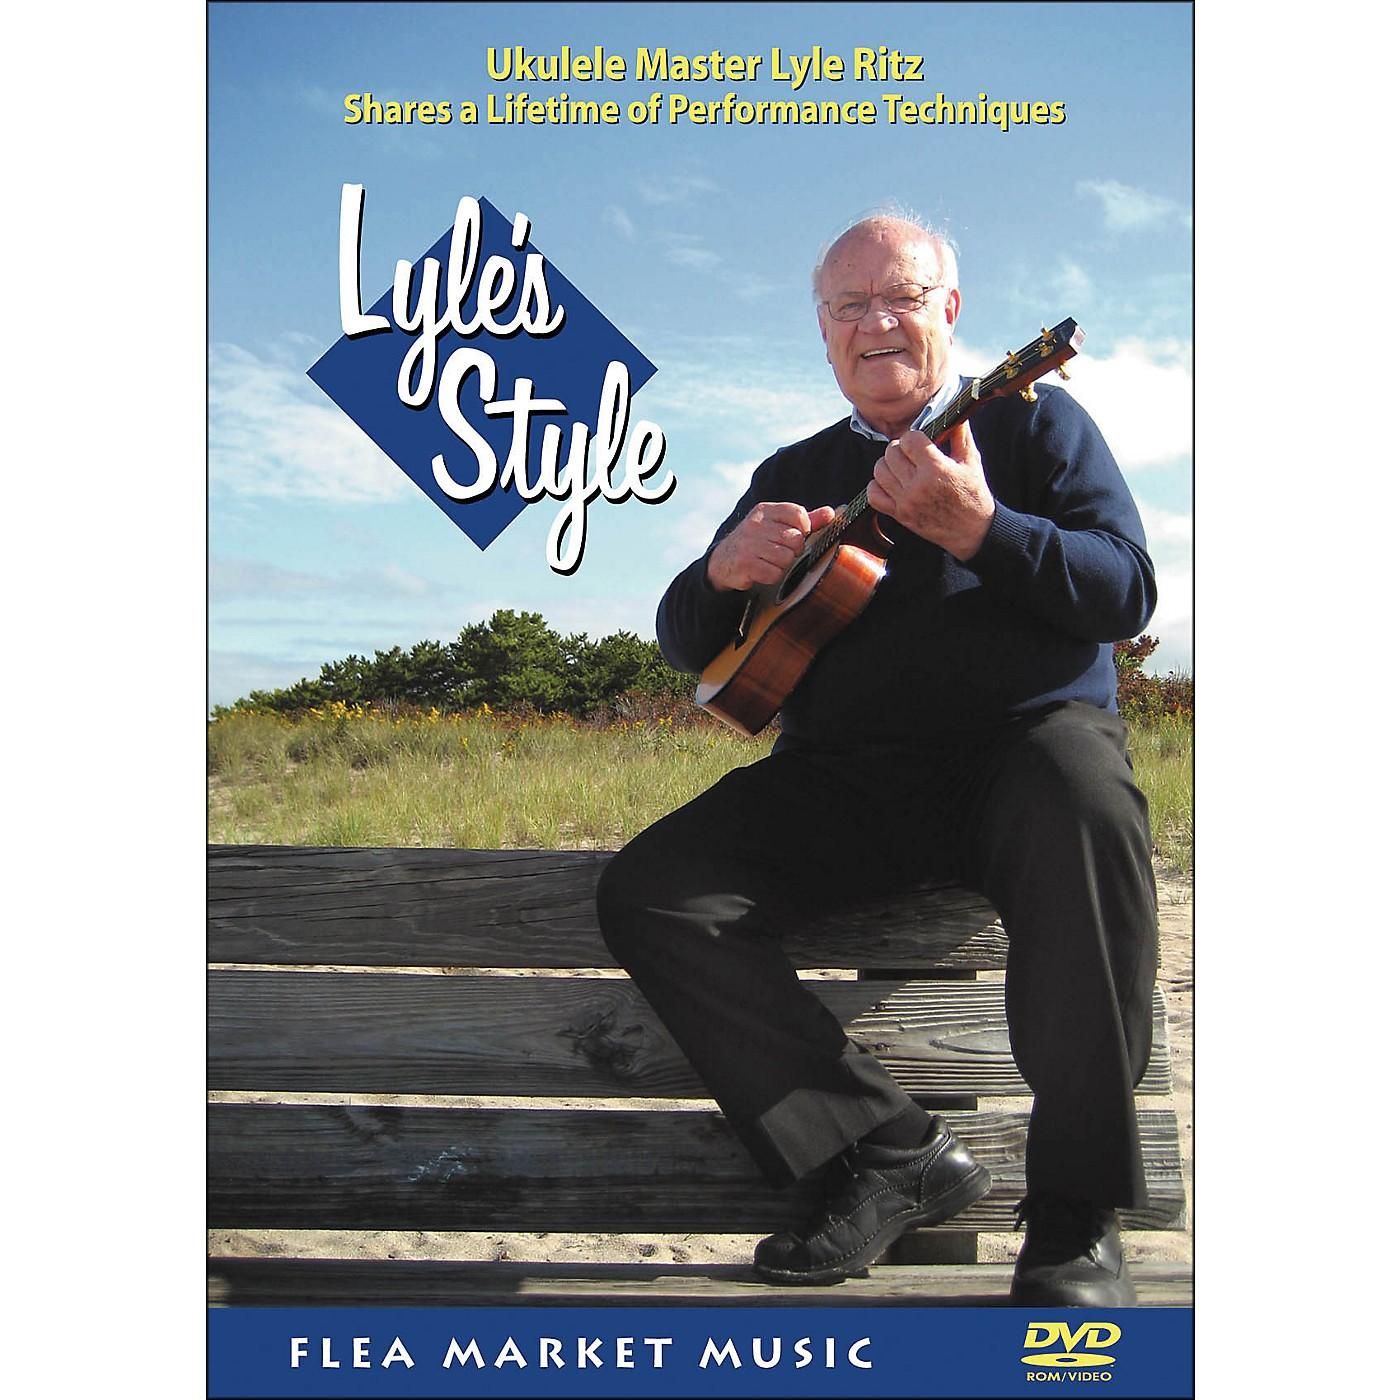 Hal Leonard Lyle's Style: Ukulele Master Lyle Ritz Shares A Lifetime Of Performance Technique (DVD) thumbnail